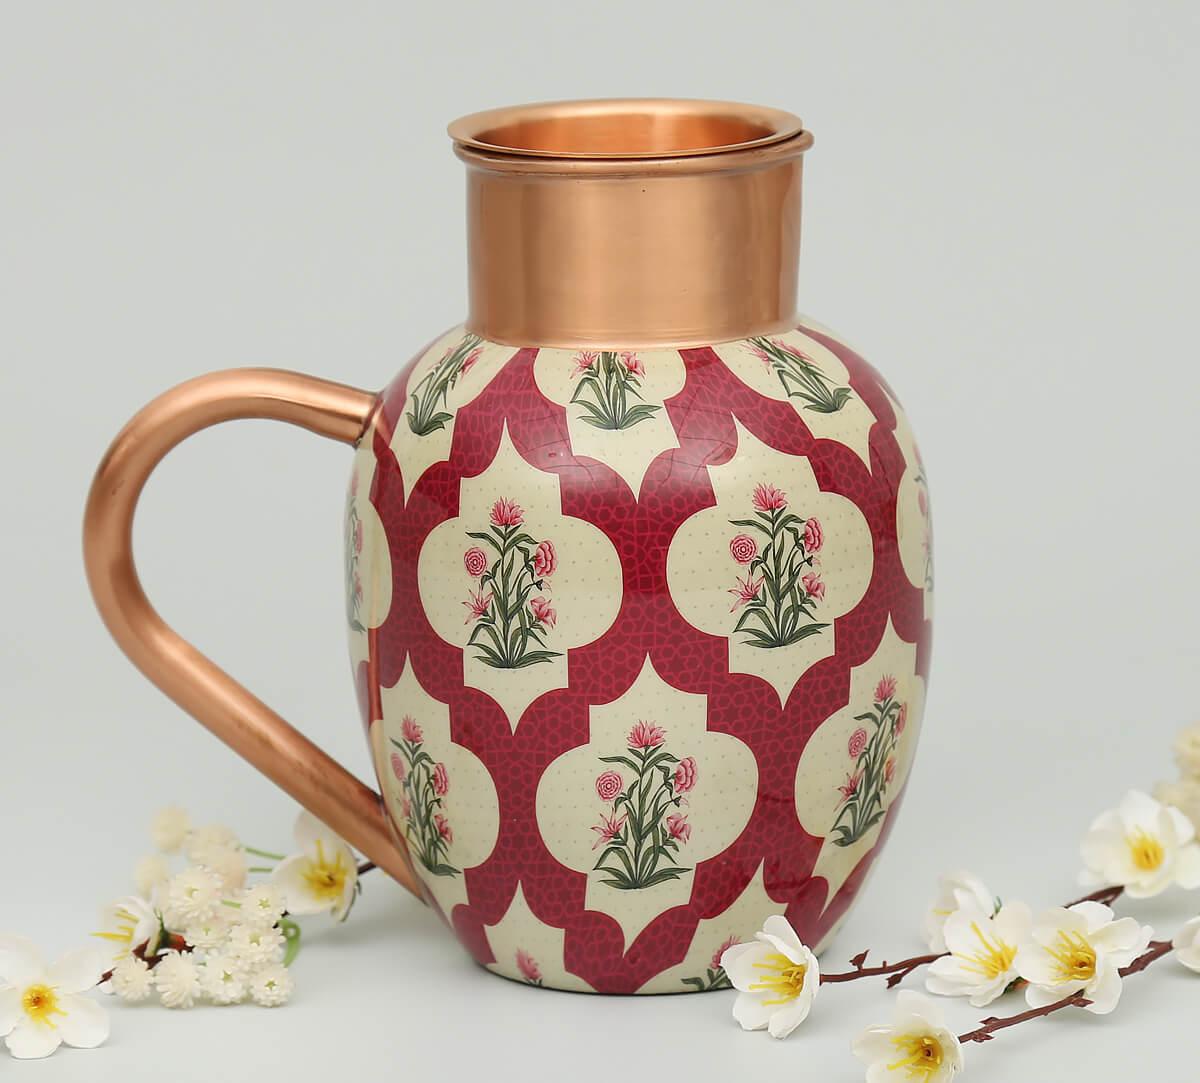 Poppy Flower Scarlet Copper Jug Set